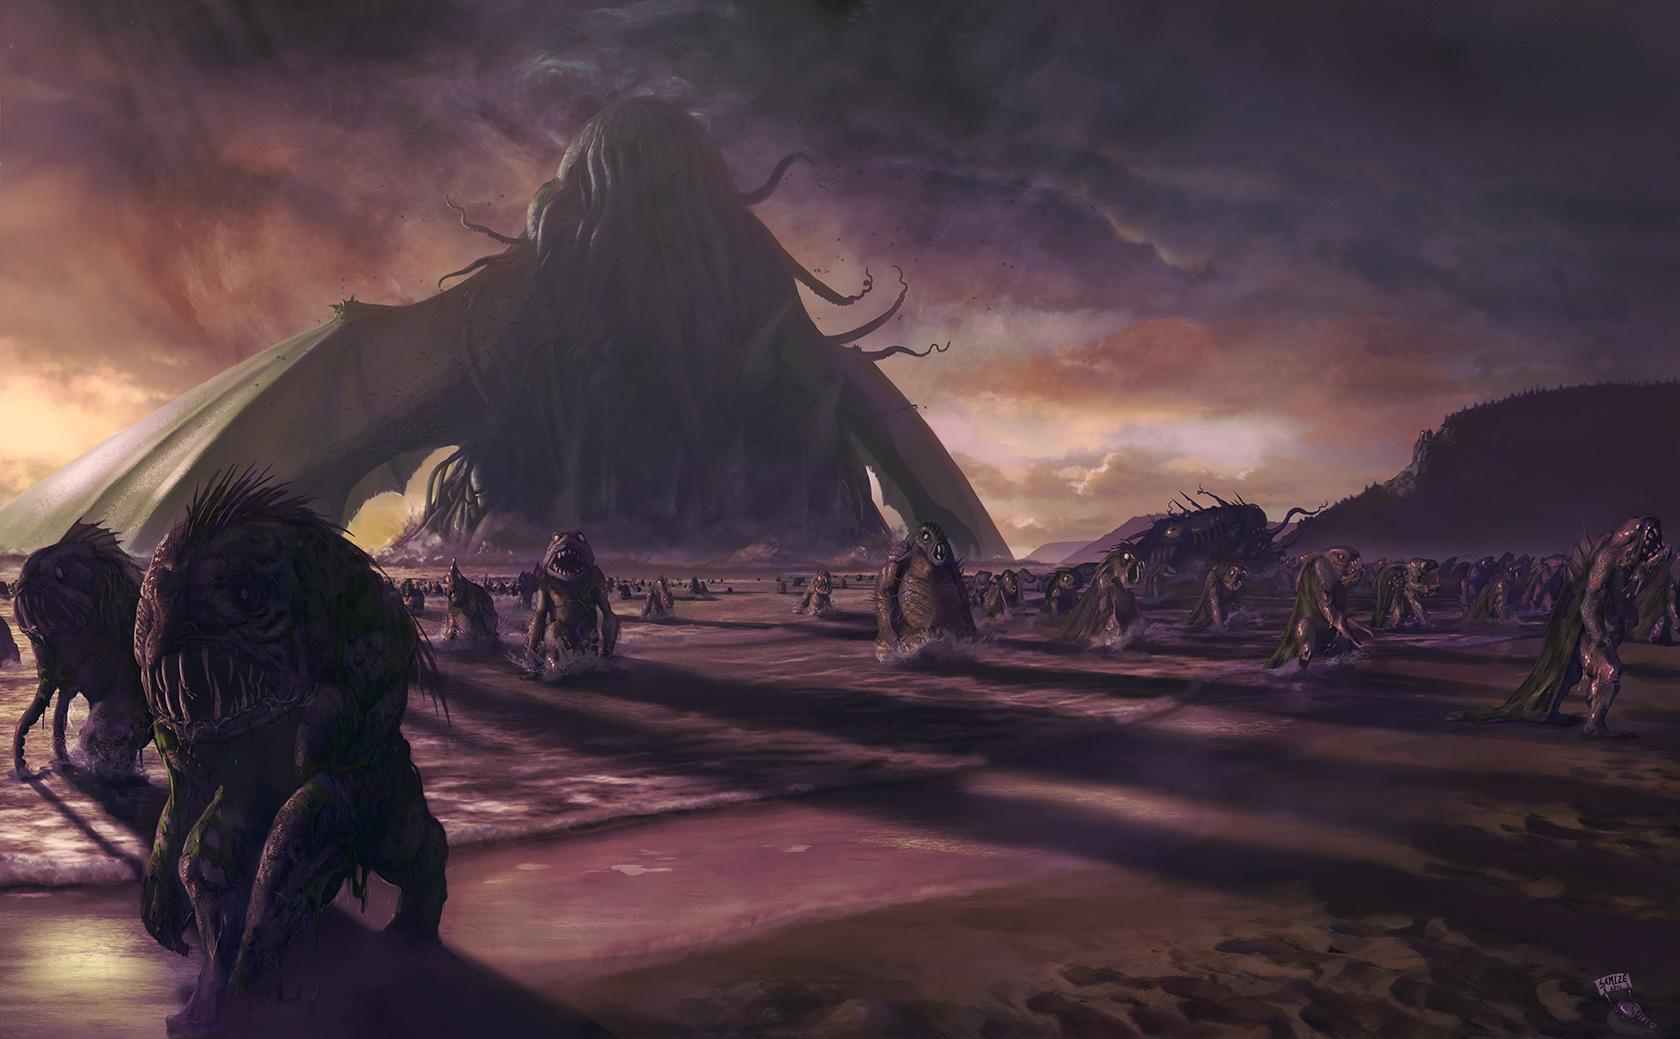 Xaltotun: Cthulhu fhtagn no more (2012). (Lovecrafti ihletésű fan art)